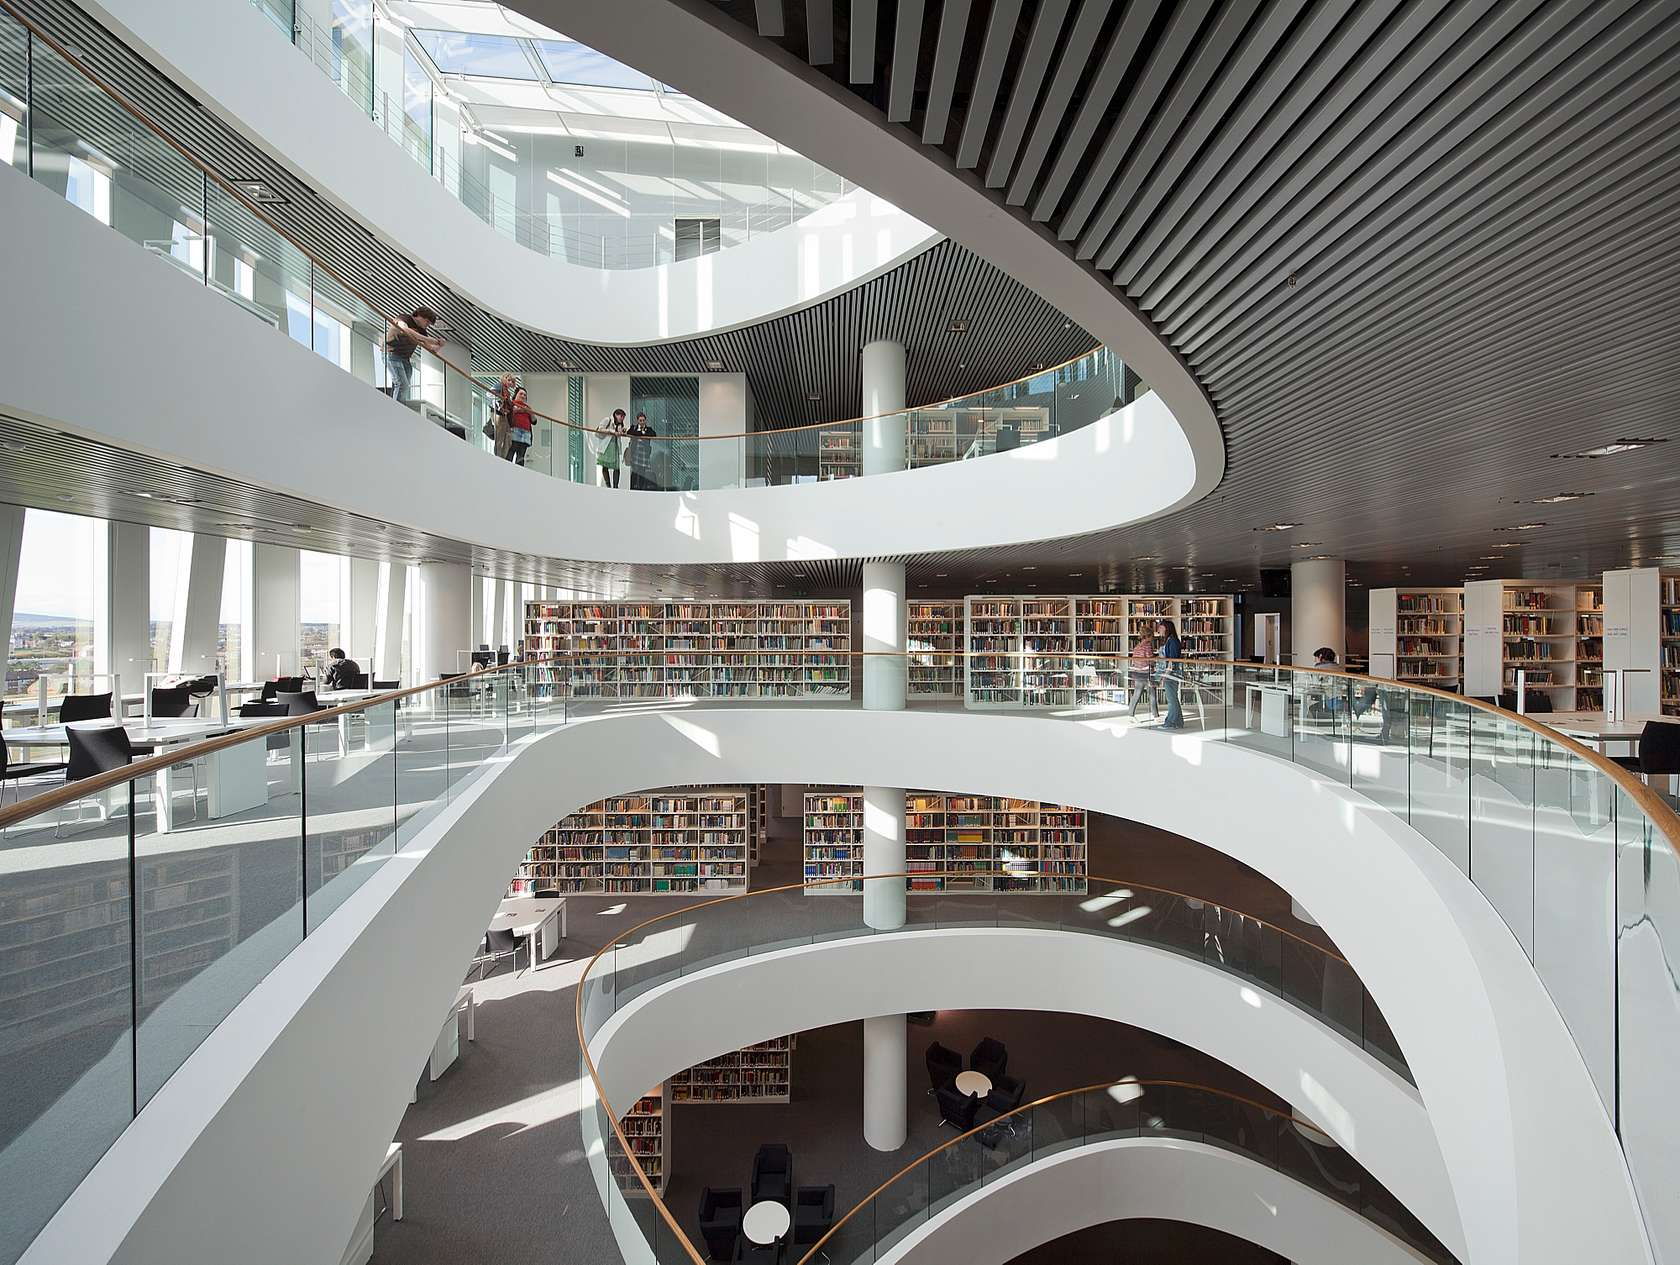 Photo of the University of Aberdeen